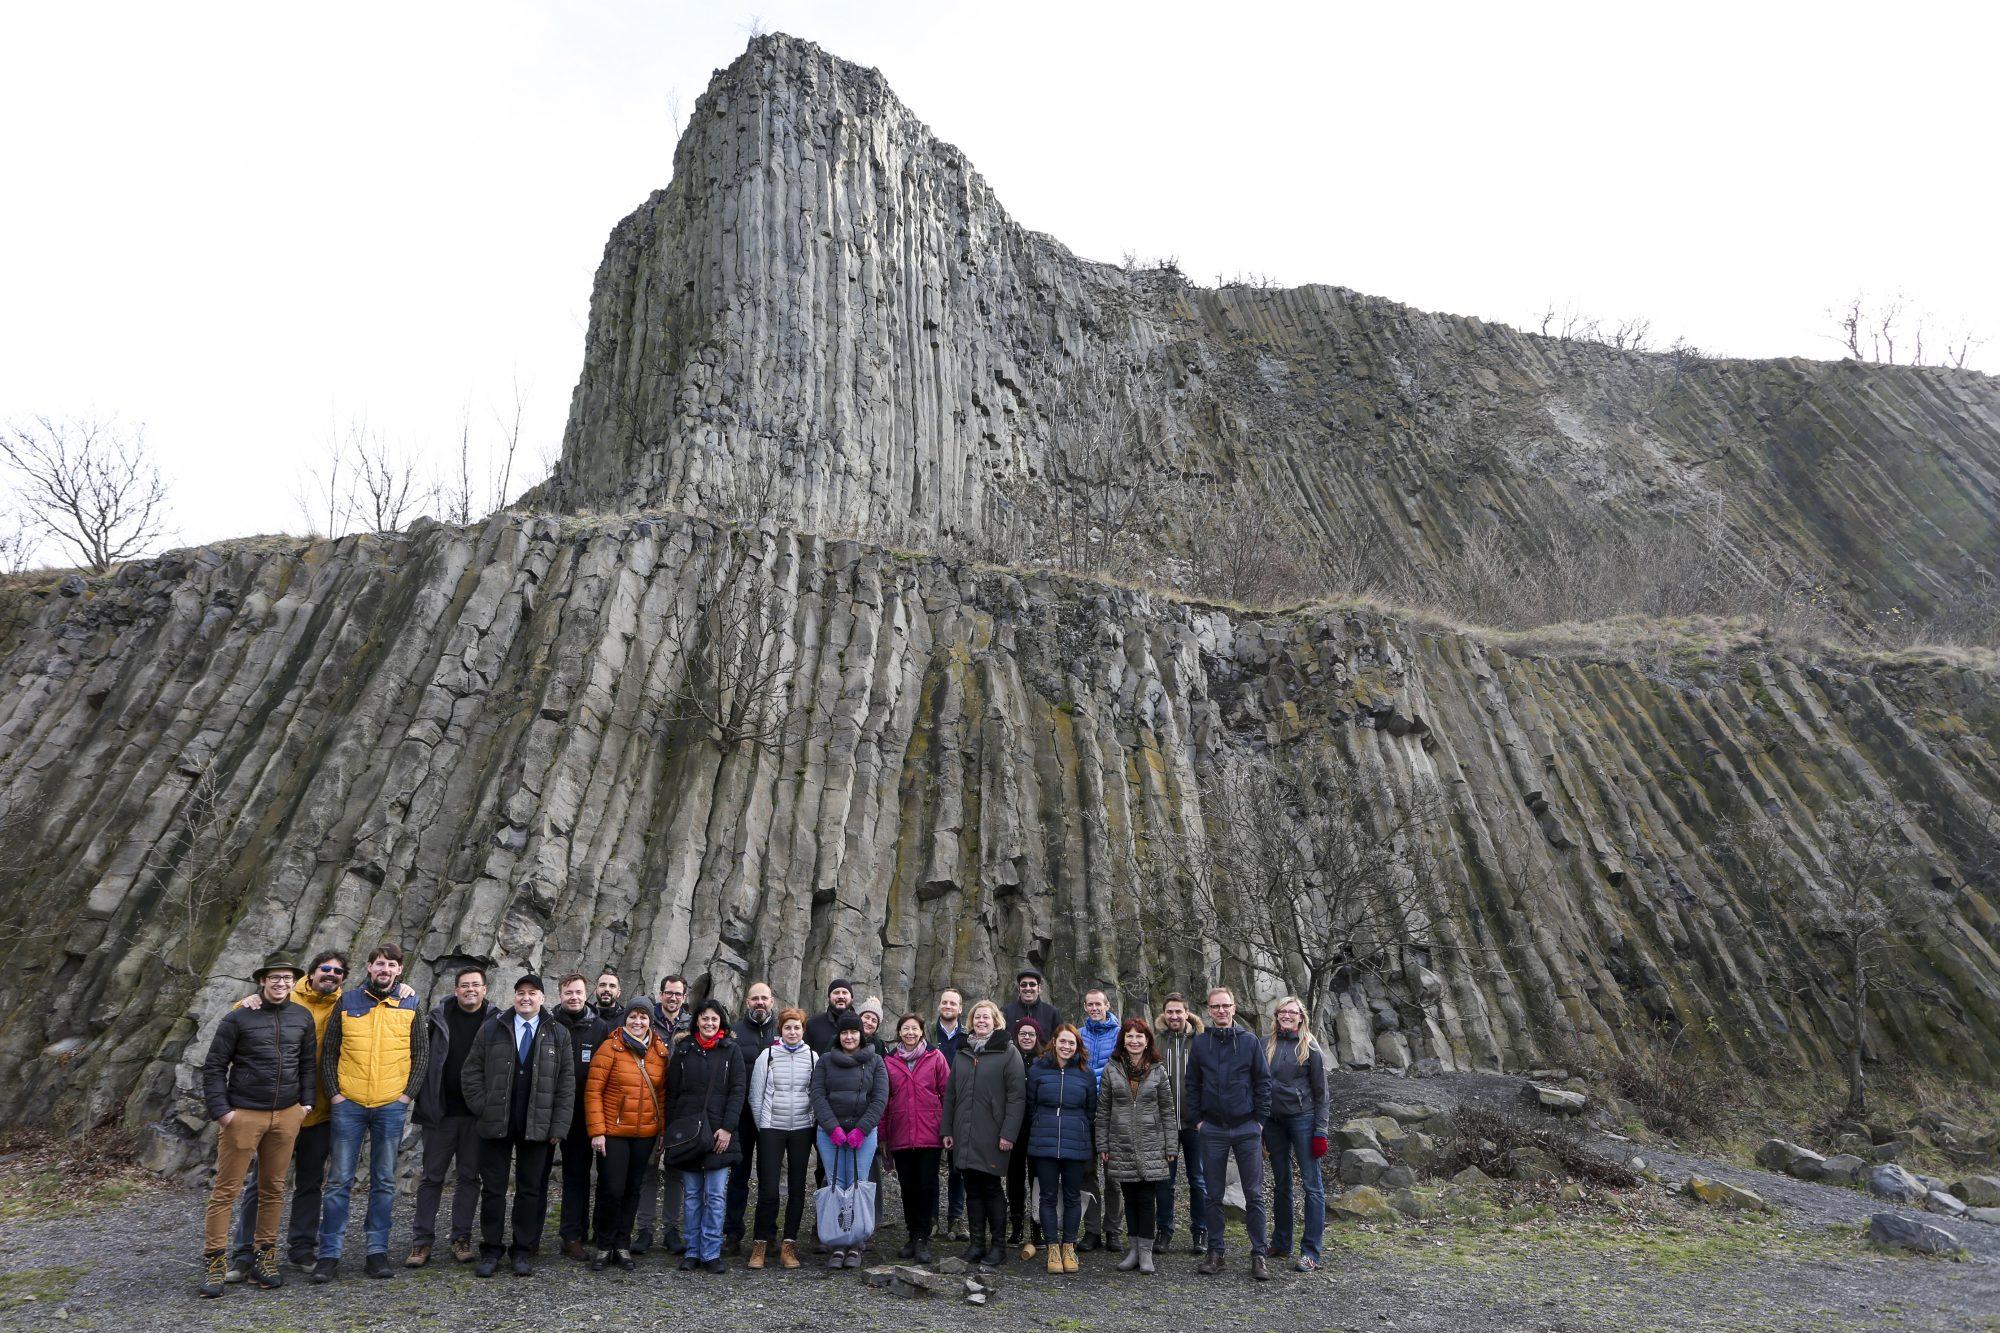 Abschlussveranstaltung Interreg Danube GeoTour im Bakony-Balaton UNESCO Global Geopark